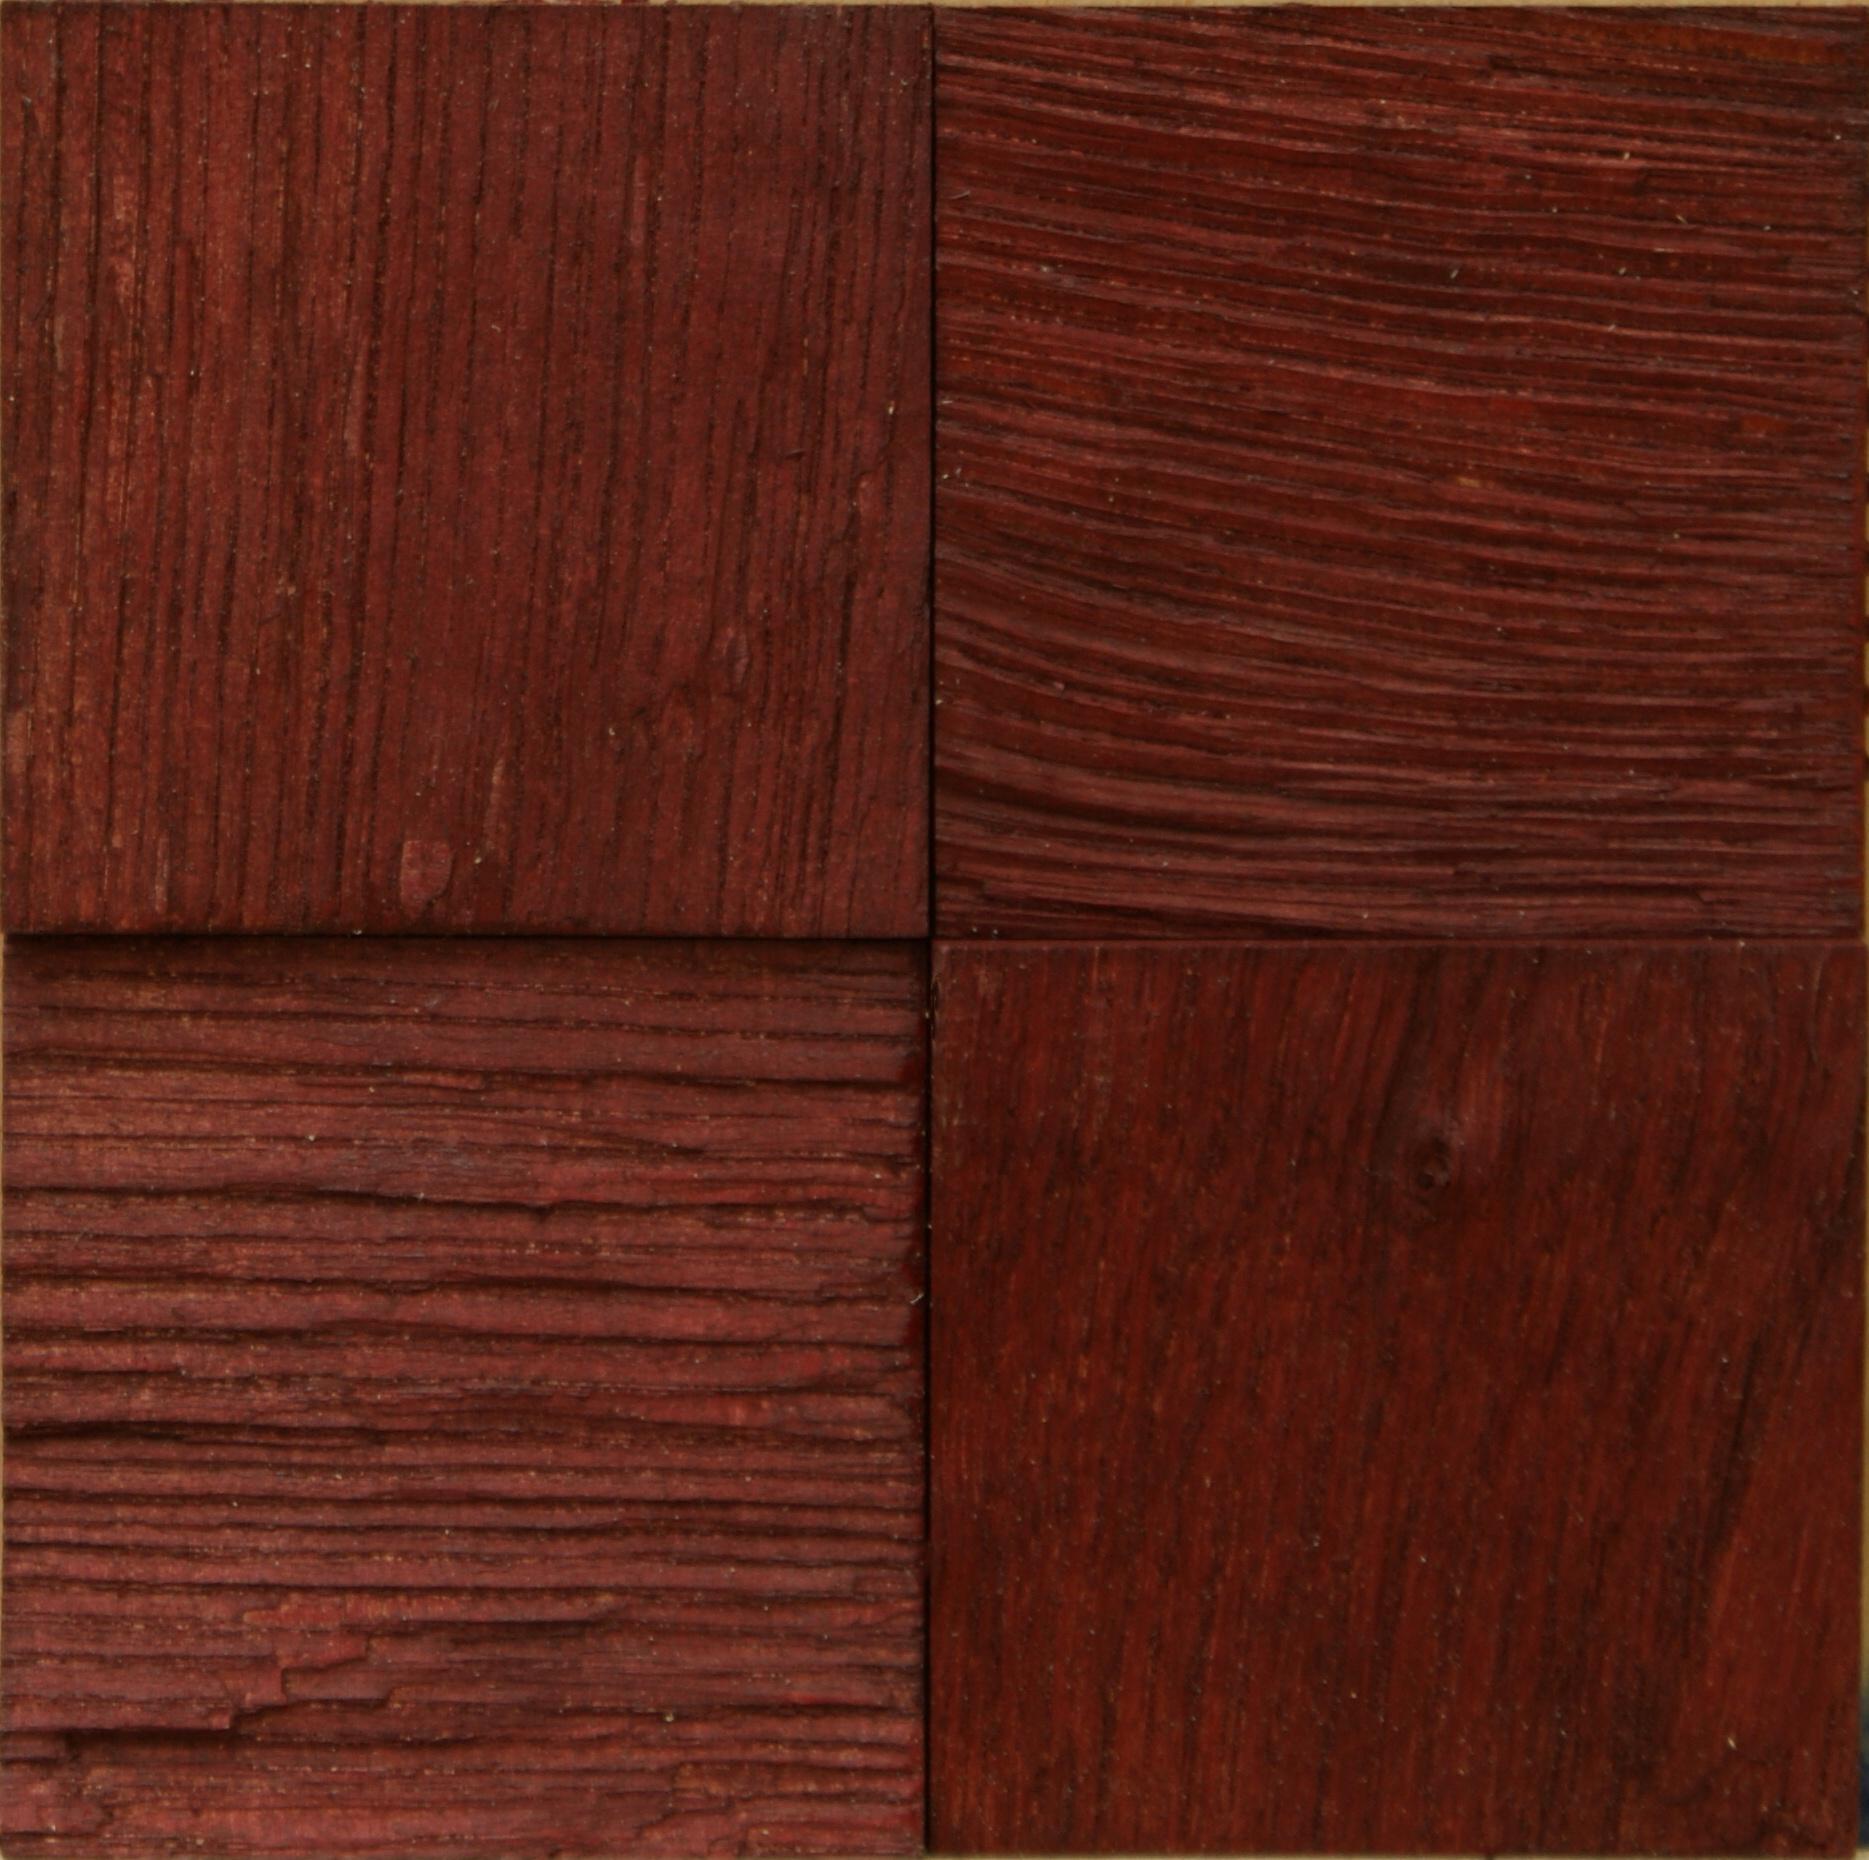 Oak Massive Tiles Bordo Oil